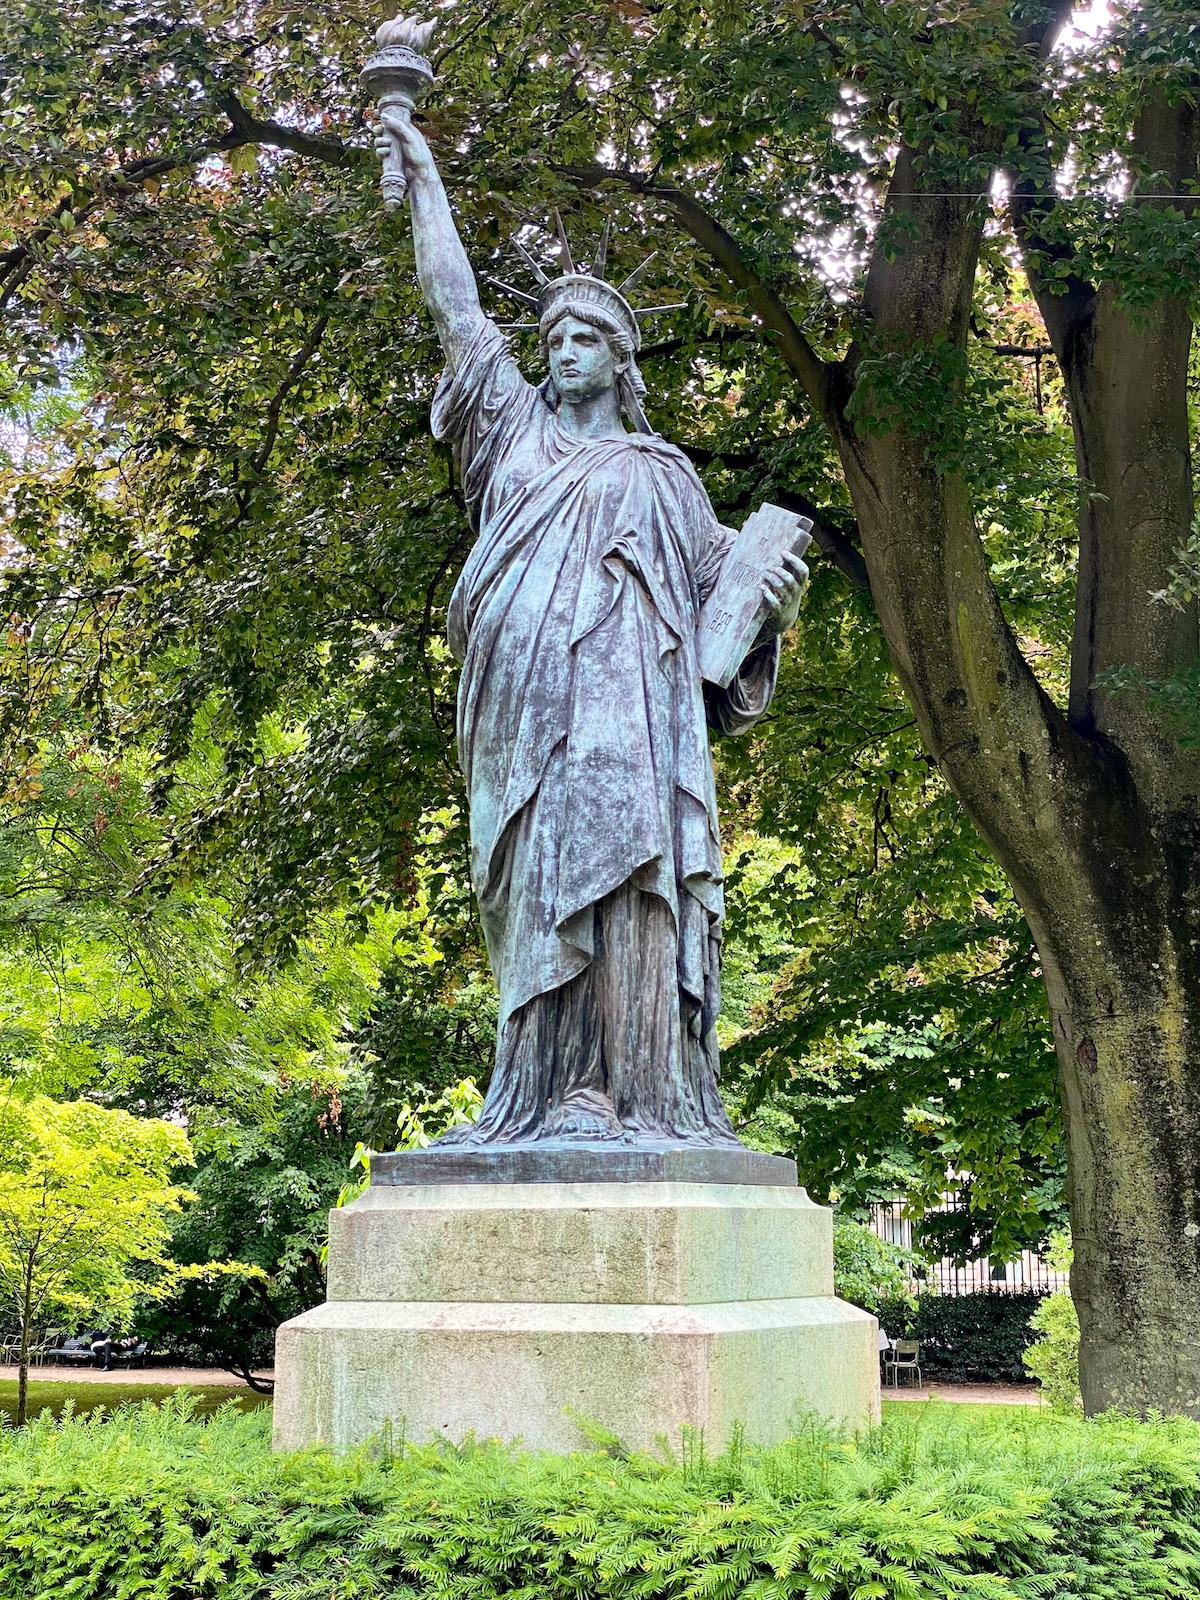 statue of liberty replica paris jardin du luxembourg